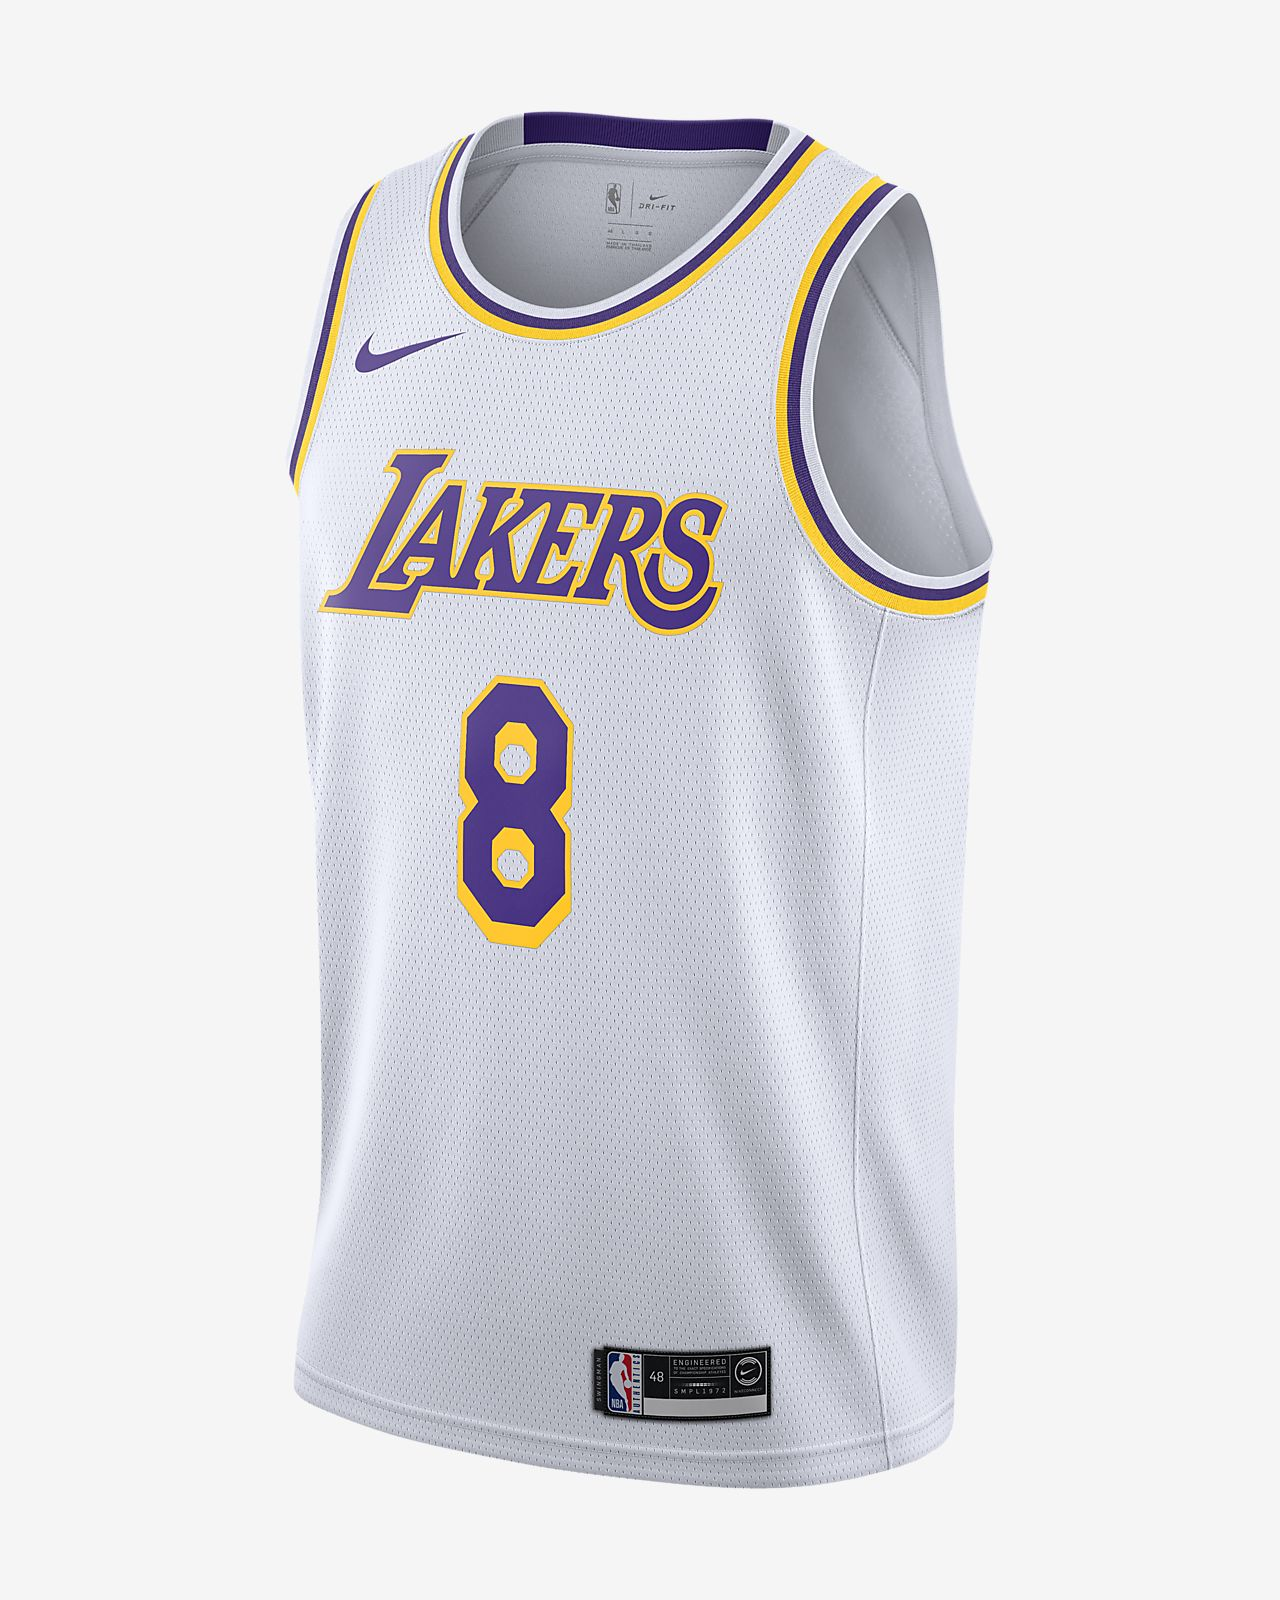 Maillot Nike NBA Swingman Kobe Bryant Lakers Association Edition